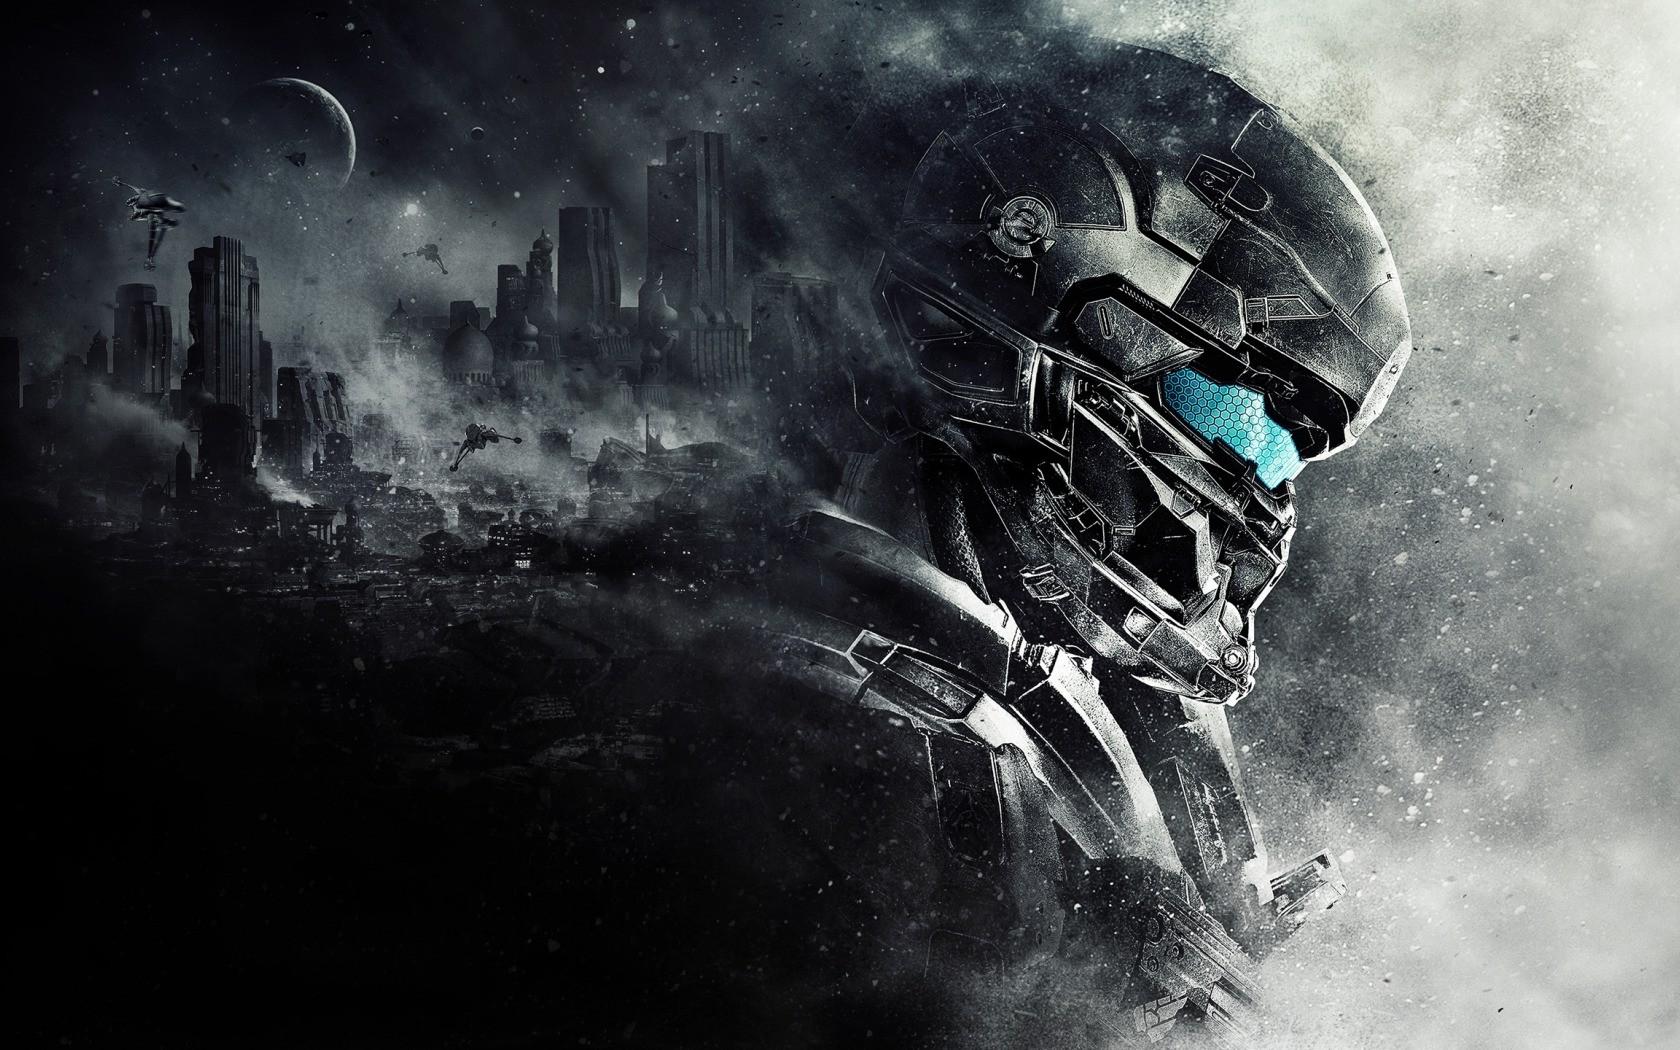 تصویر: https://gamefa.com/wp-content/uploads/2018/06/halo-5-guardians-blue-helmet-free-desktop-wallpaper-1680x1050-e1441791263306.jpg